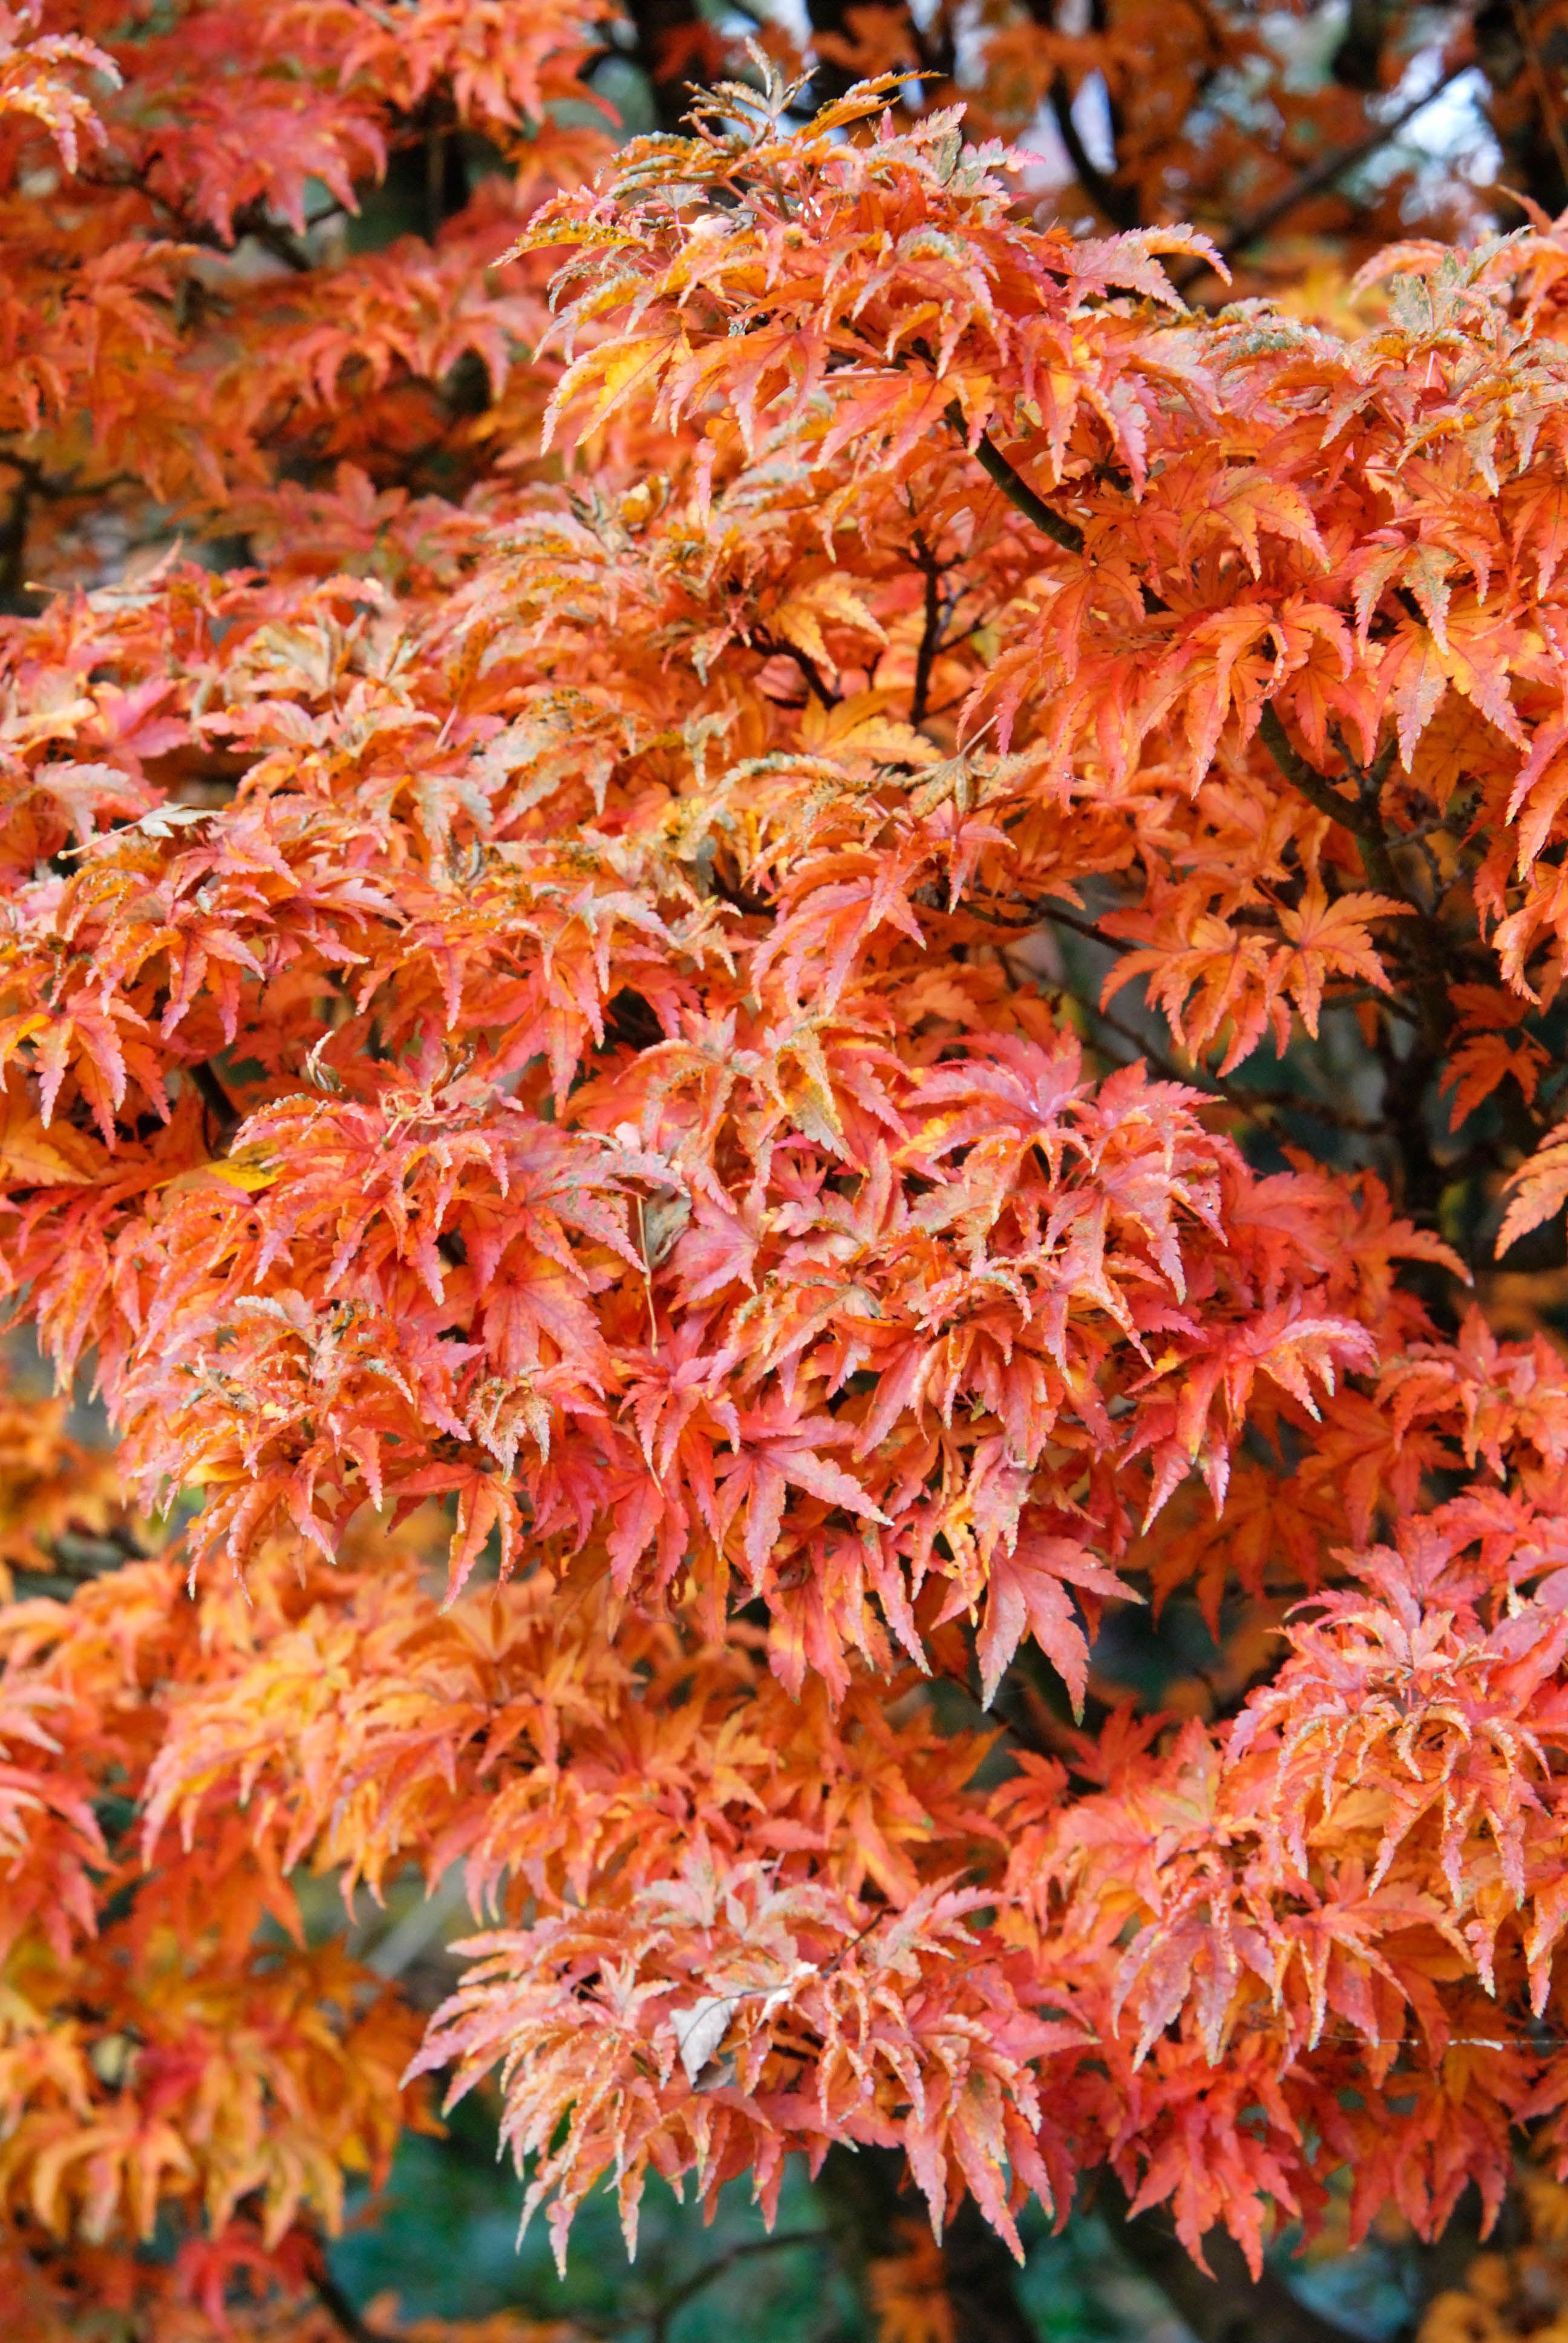 shishigashira japanese maple acer palmatum 39 shishigashira 39 monrovia love acers shrubs. Black Bedroom Furniture Sets. Home Design Ideas